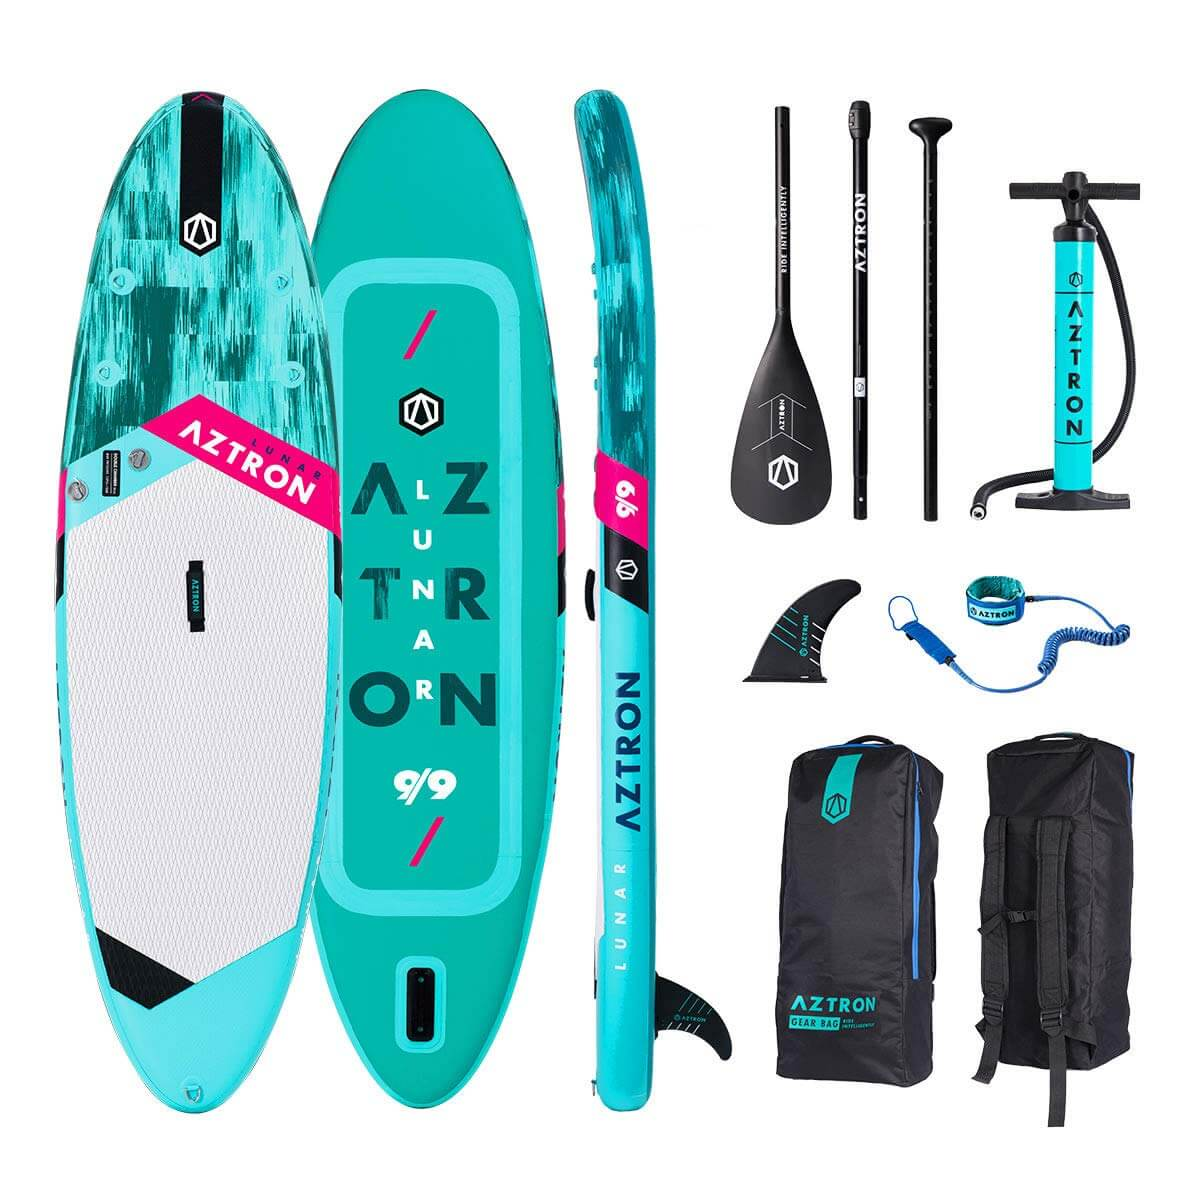 0a025e30cf5f aztron-lunar-sup-board-with-accessories-paddle-handpump-